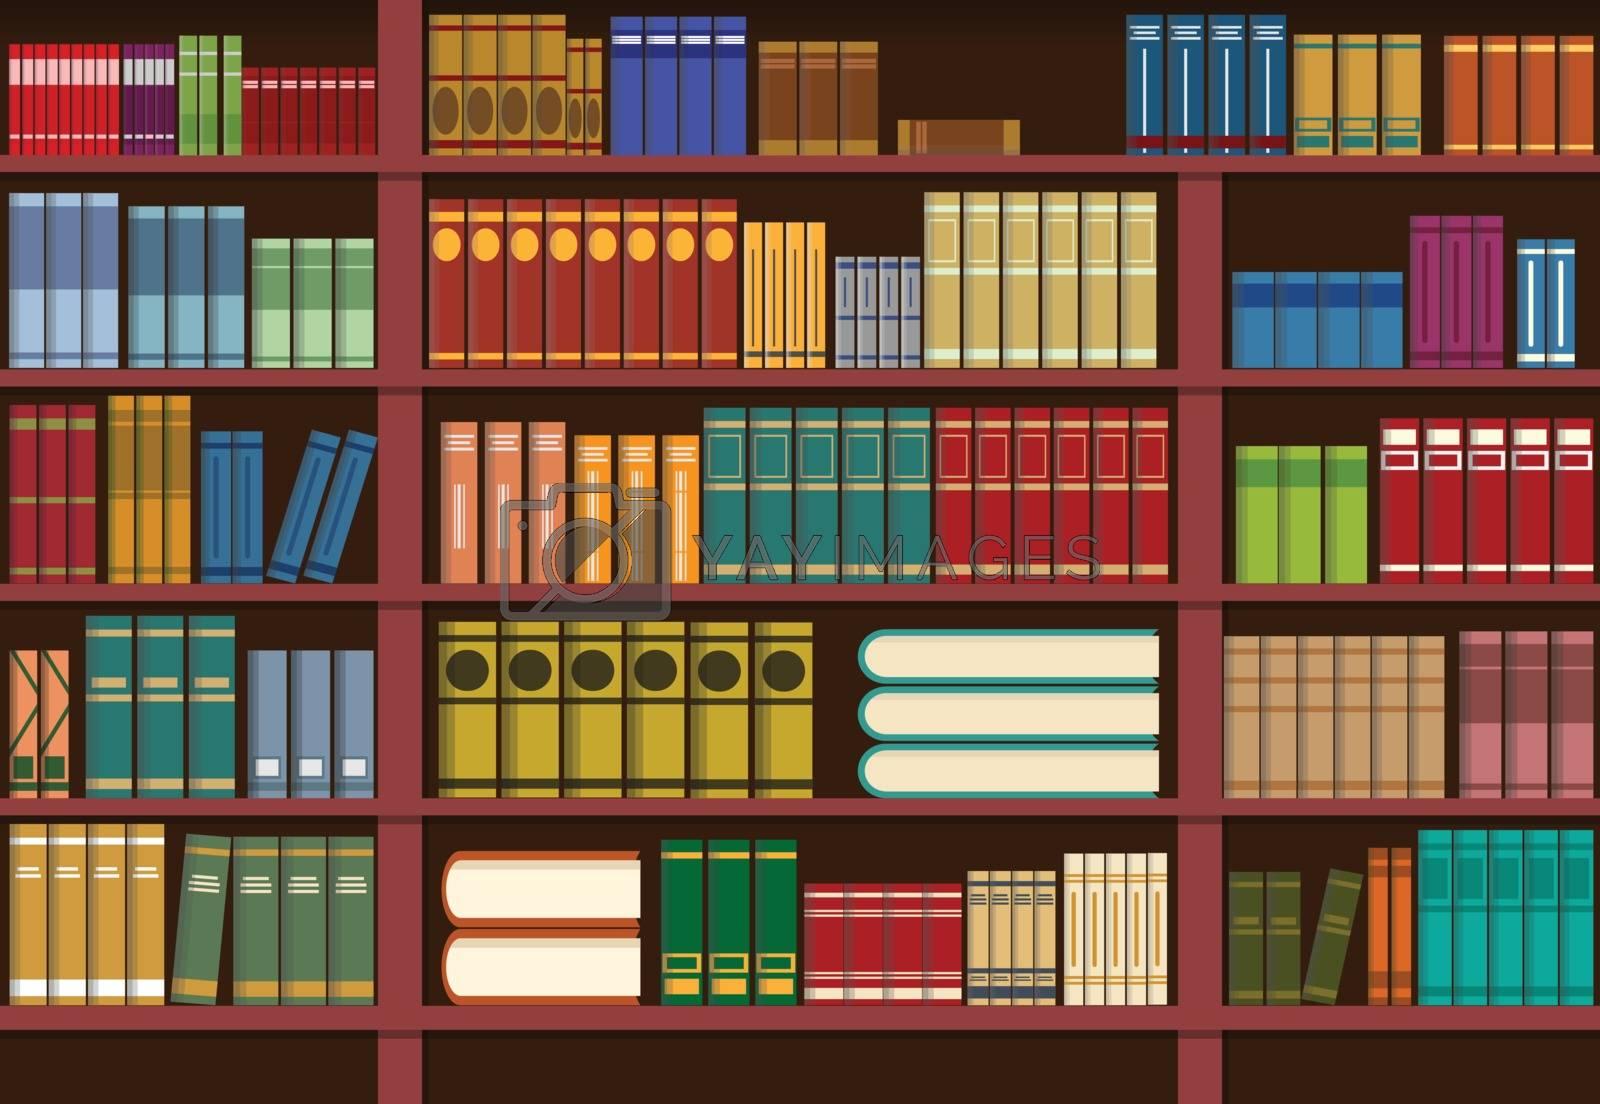 Bookshelf in library, knowledge illustration